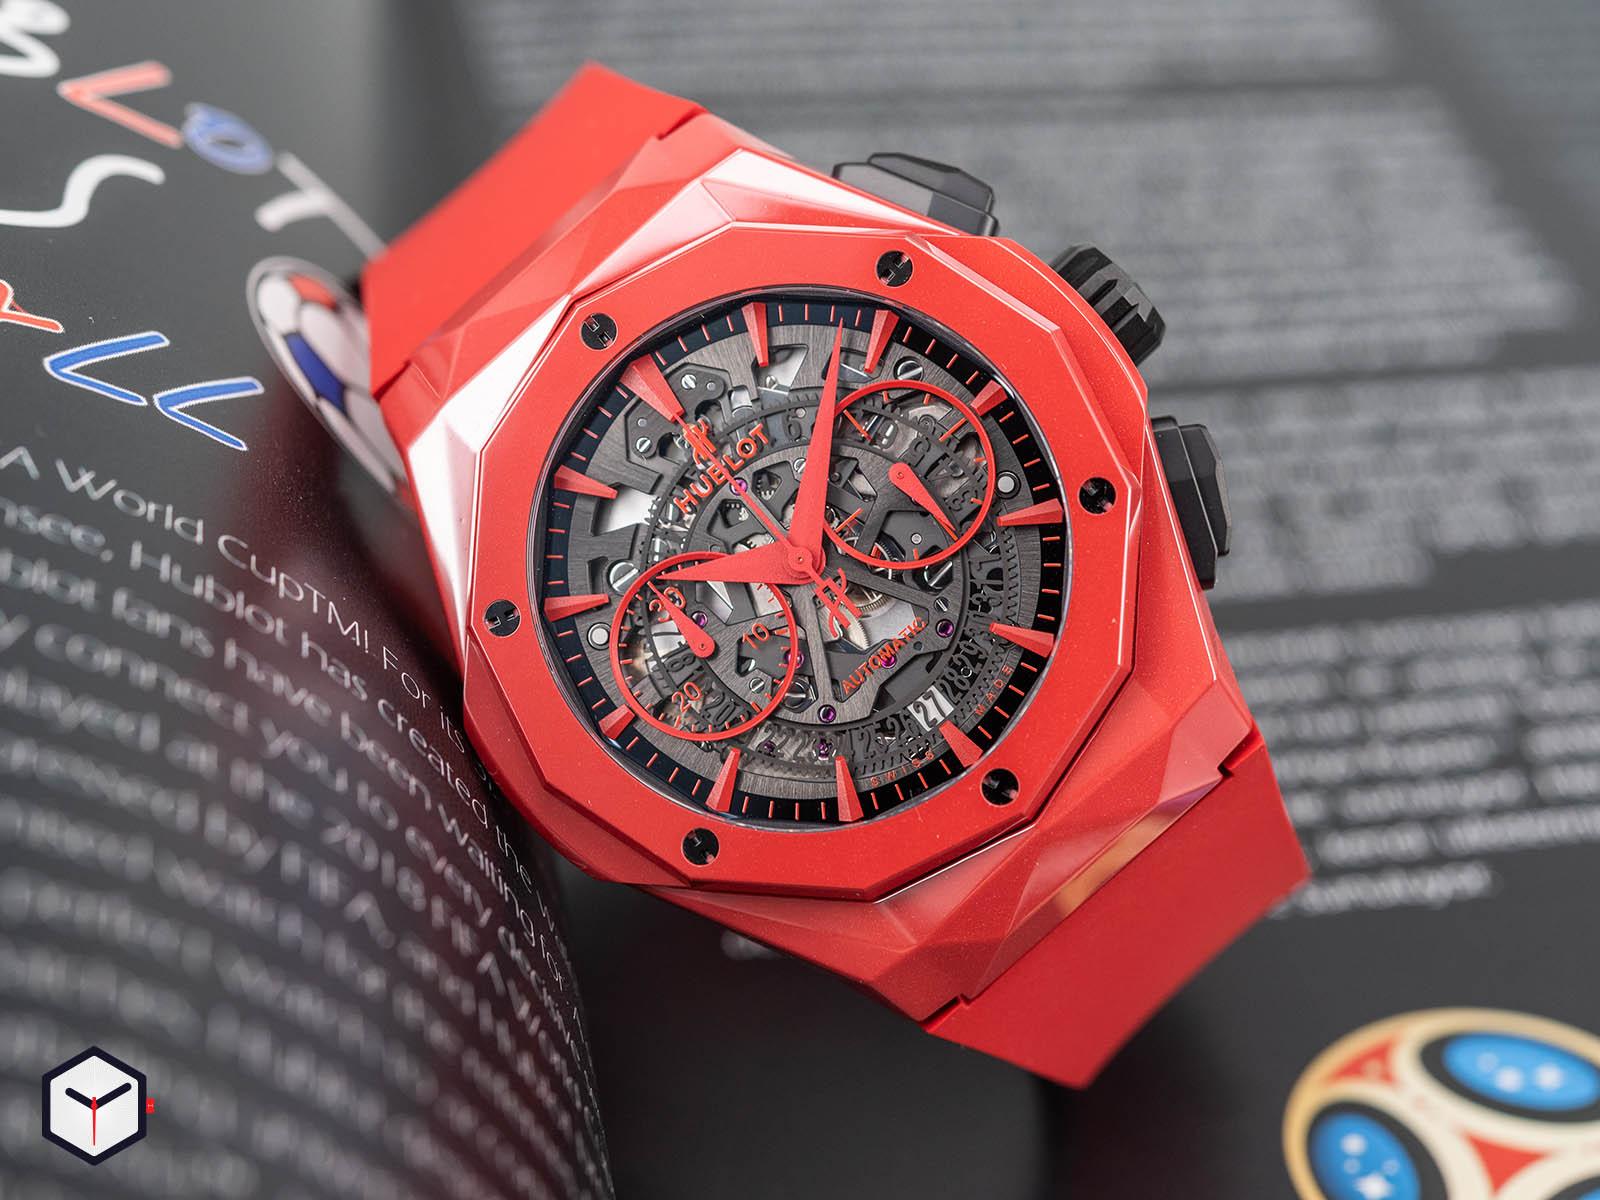 525-cf-0130-rx-orl19-hublot-classic-fusion-chronograph-orlinski-red-ceramic-2.jpg